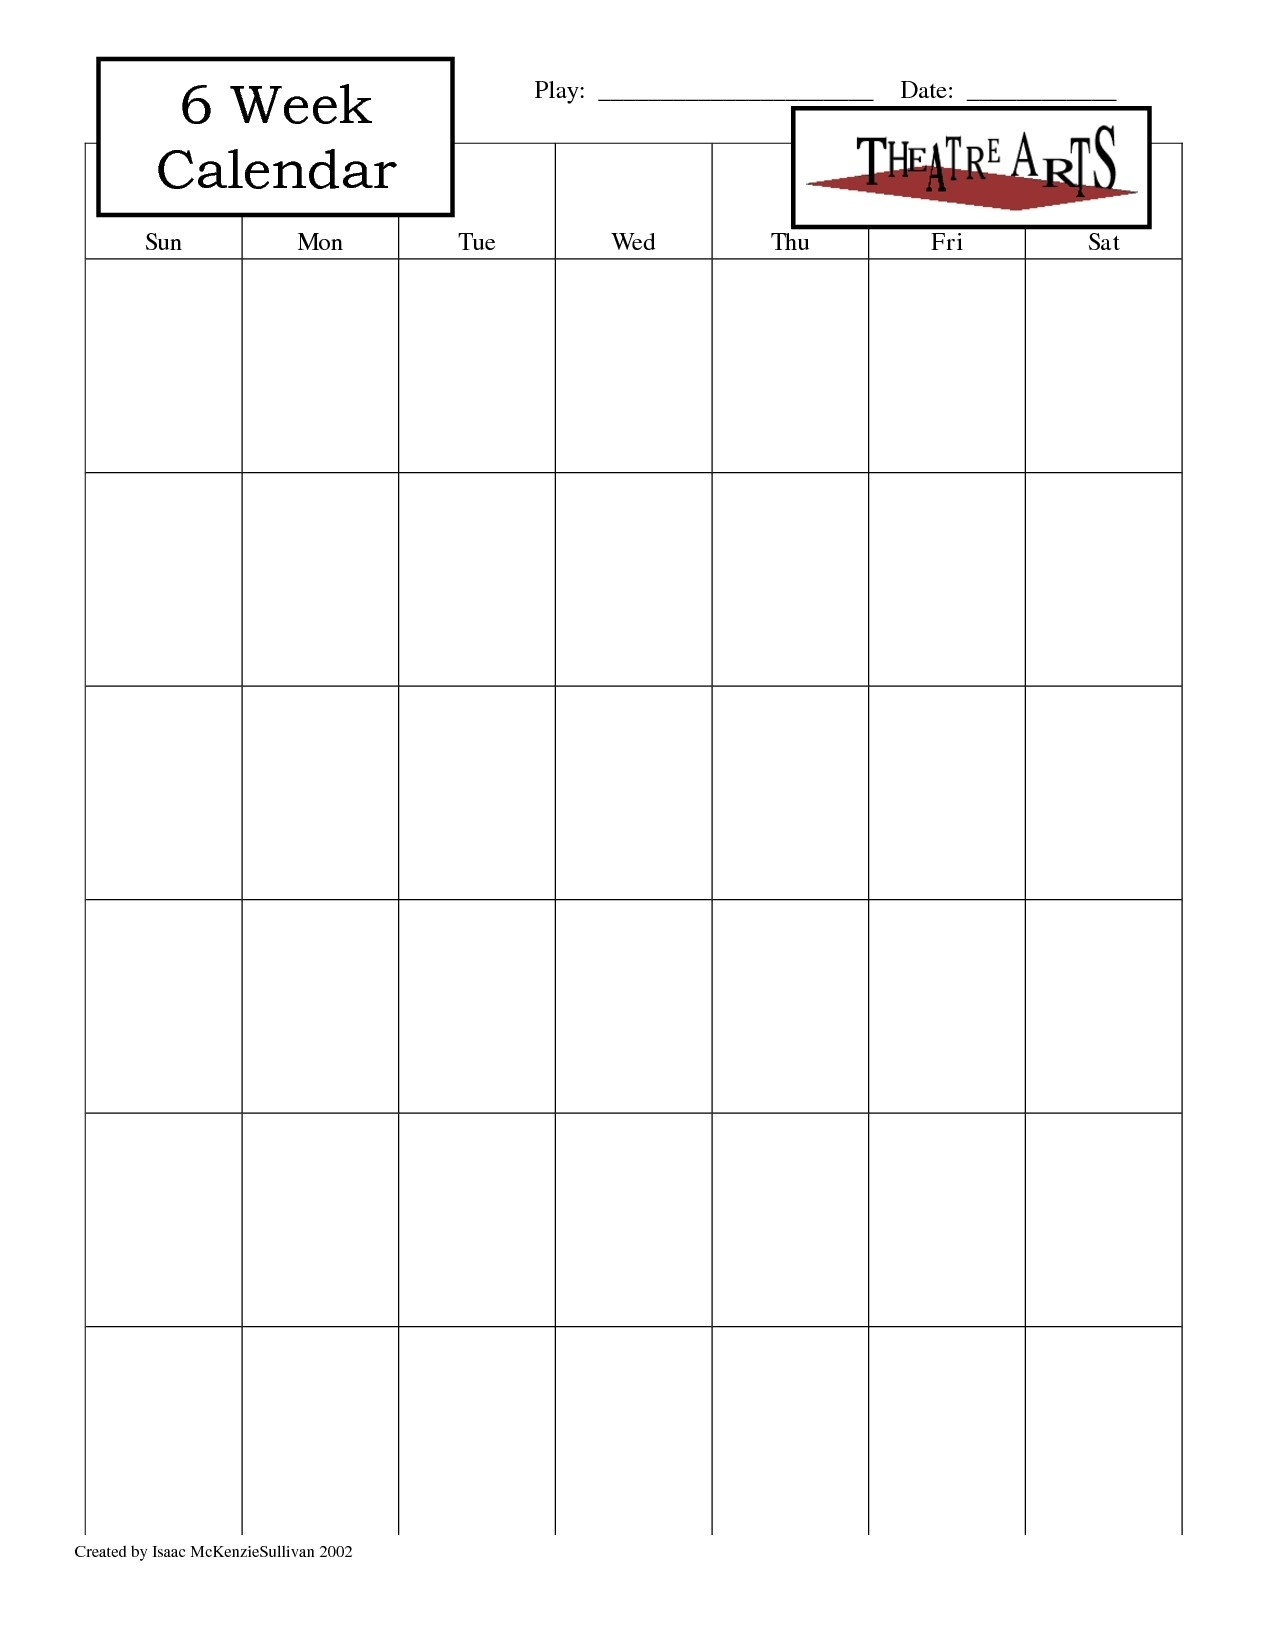 Dashing Blank Calendar 6 Week • Printable Blank Calendar Template inside 6 Week Blank Calendar Printable